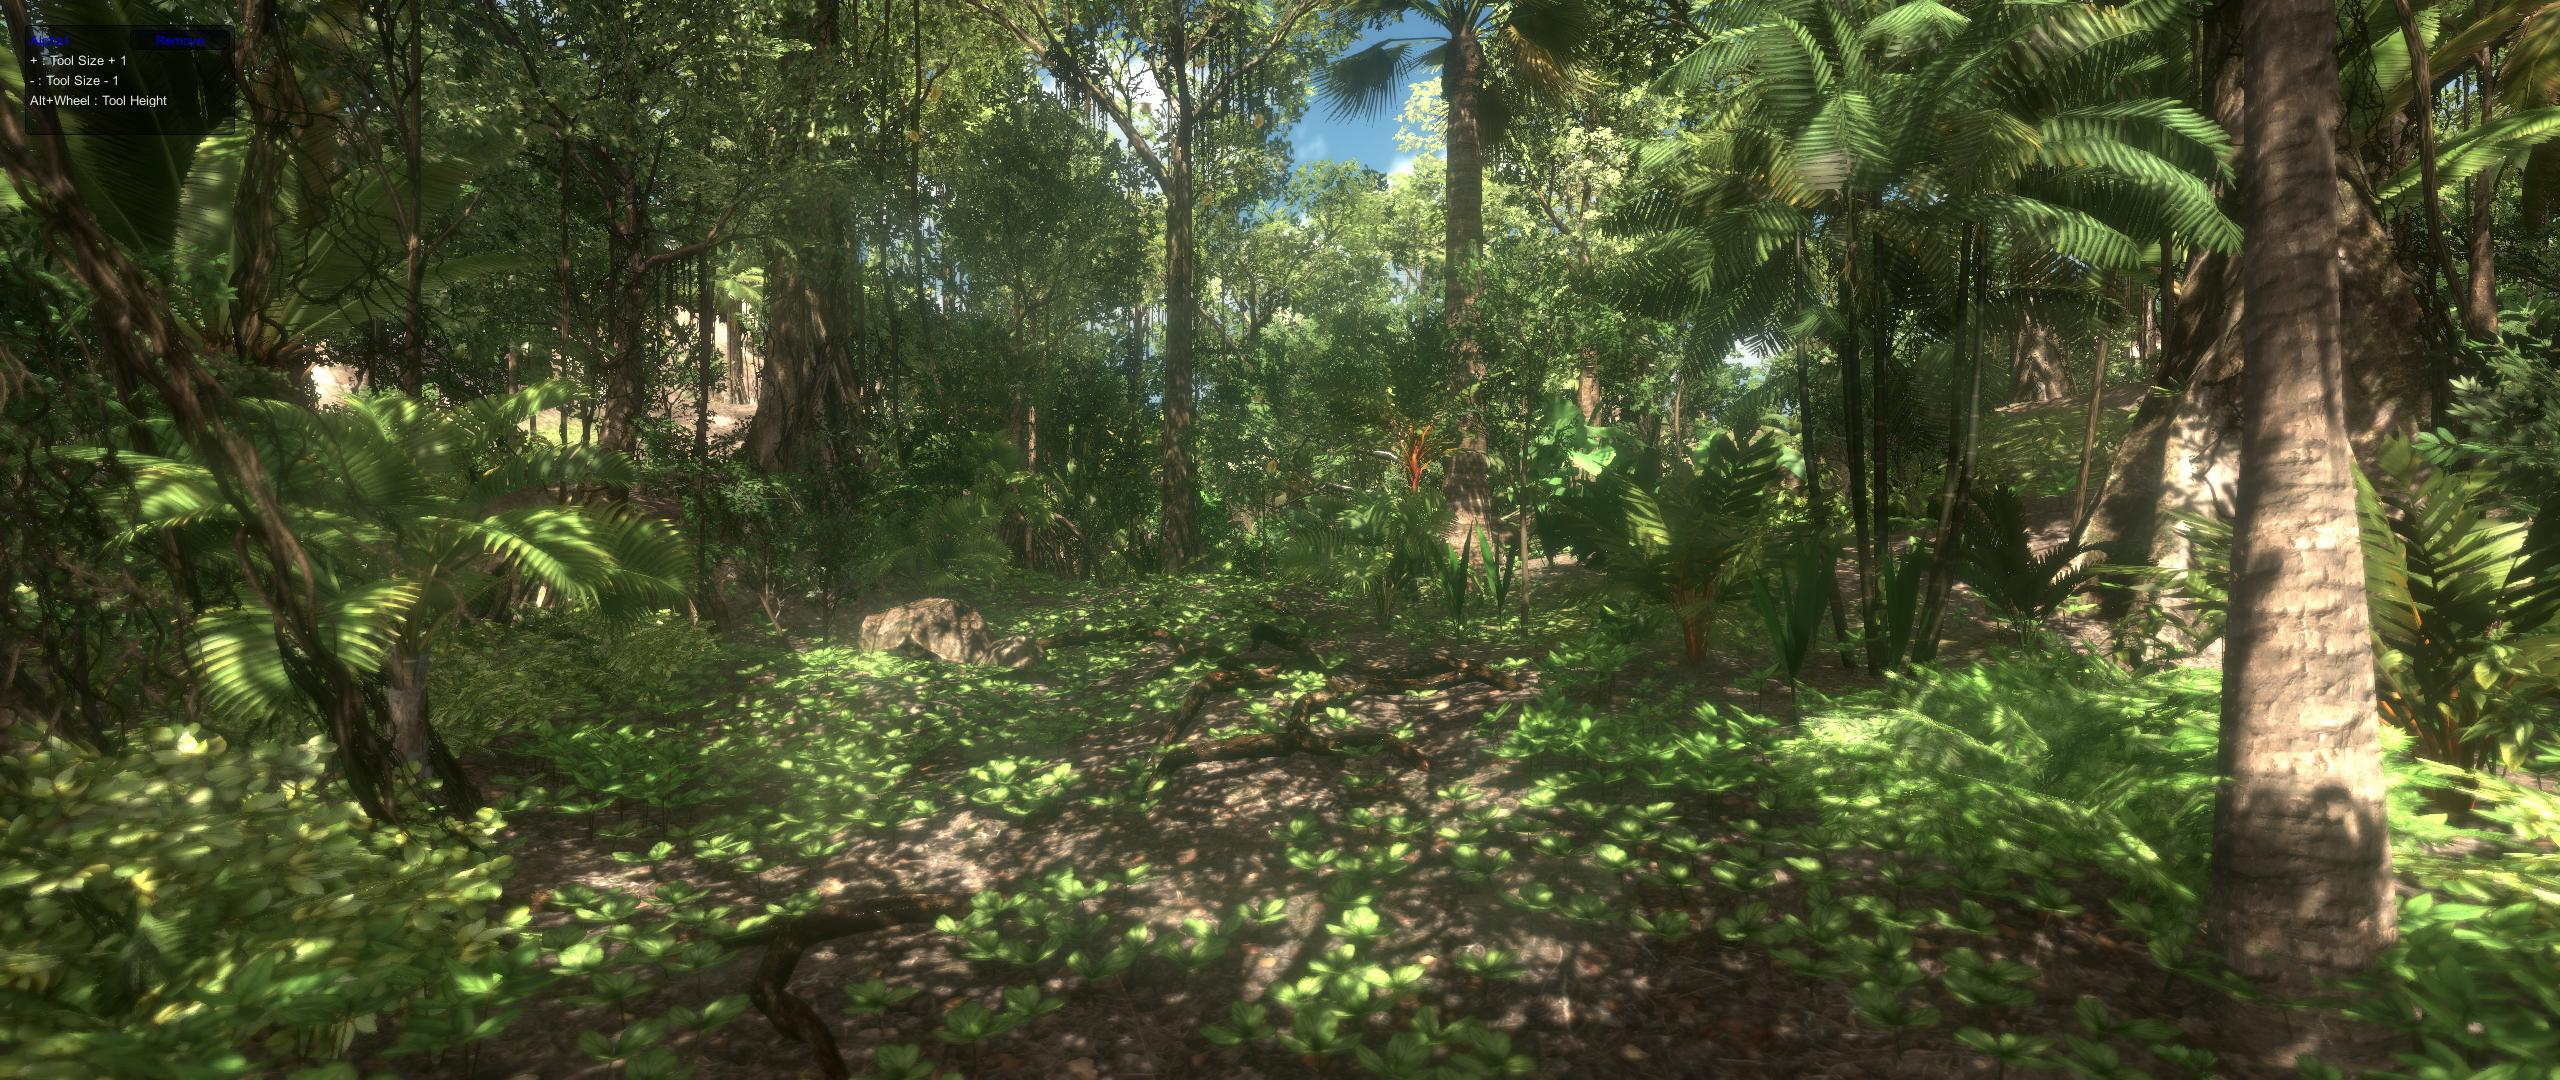 TropicalPack54Lin 2016-07-18 00-50-42-85.jpg